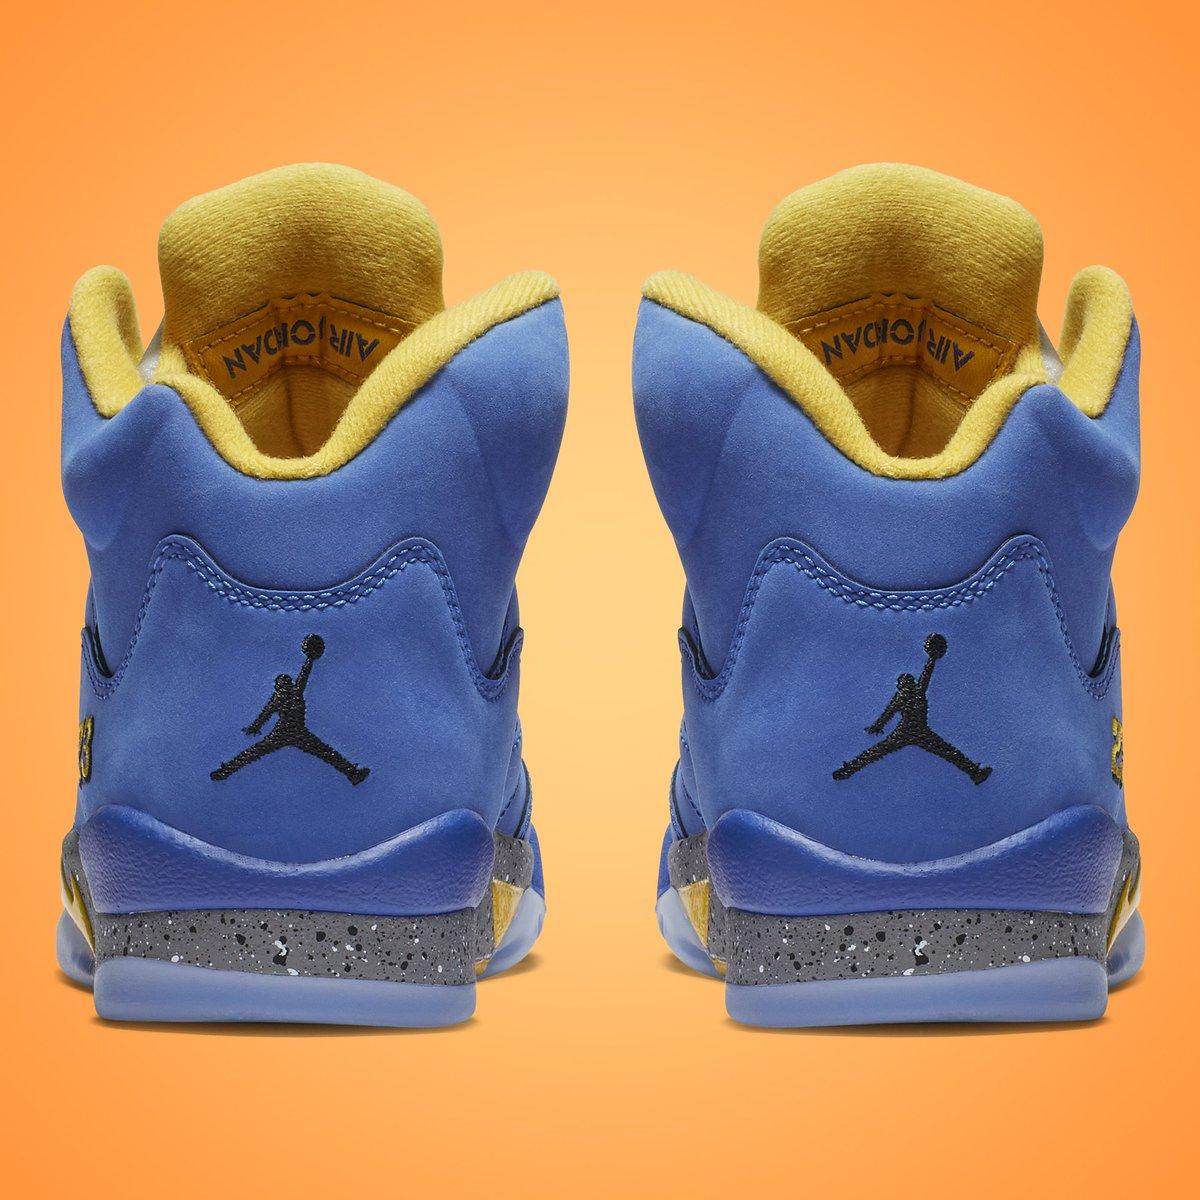 brand new 543e7 b3bba Air Jordan 5 Laney JSP